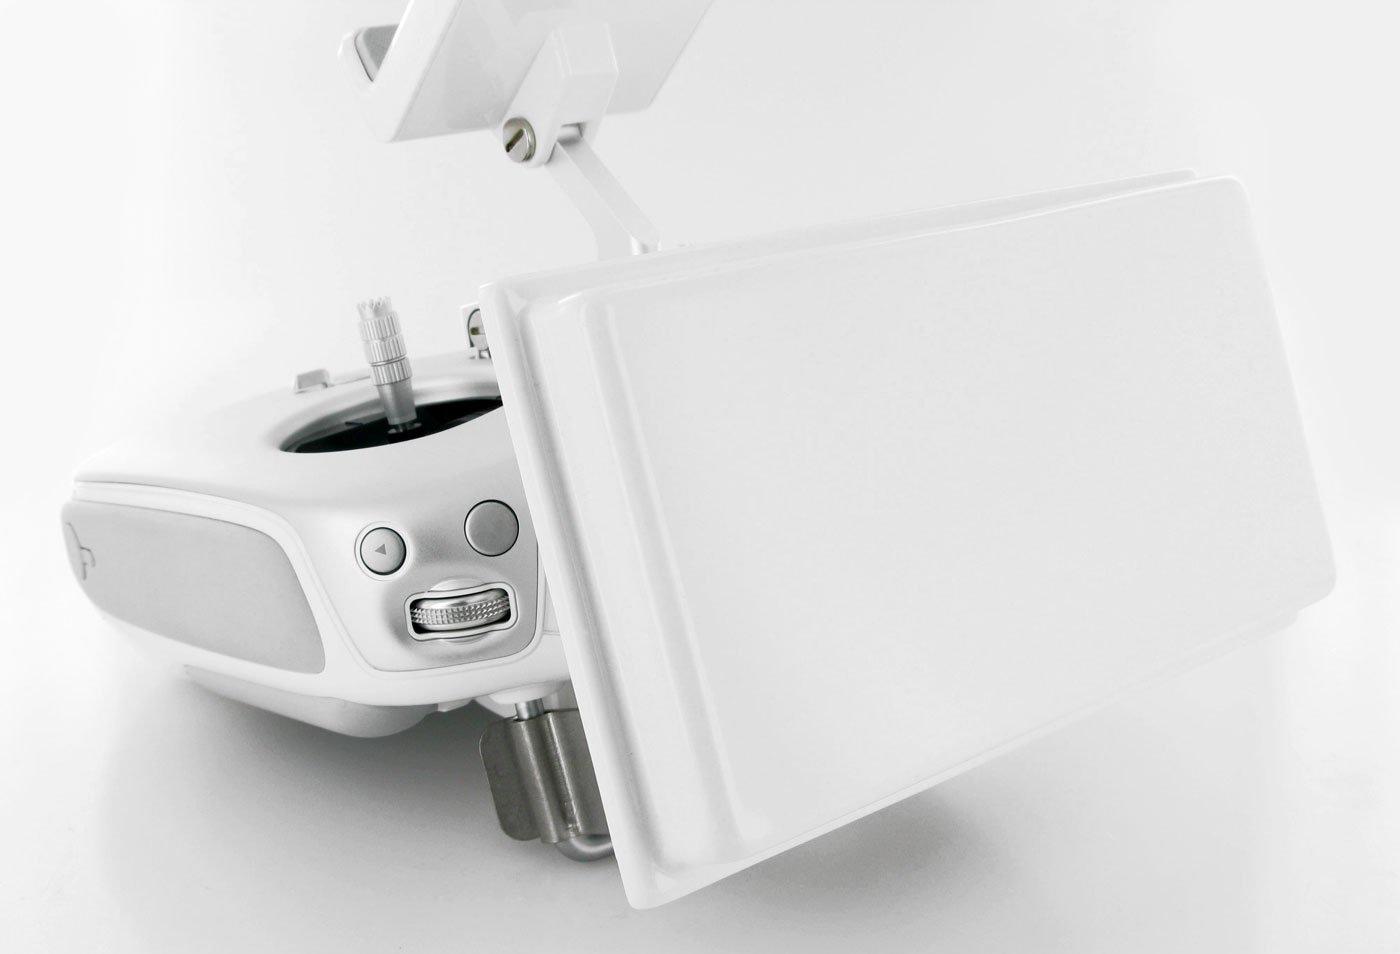 Усилитель сигнала ITElite Range Extender для Phantom/Matrice 100/Inspire 1-5